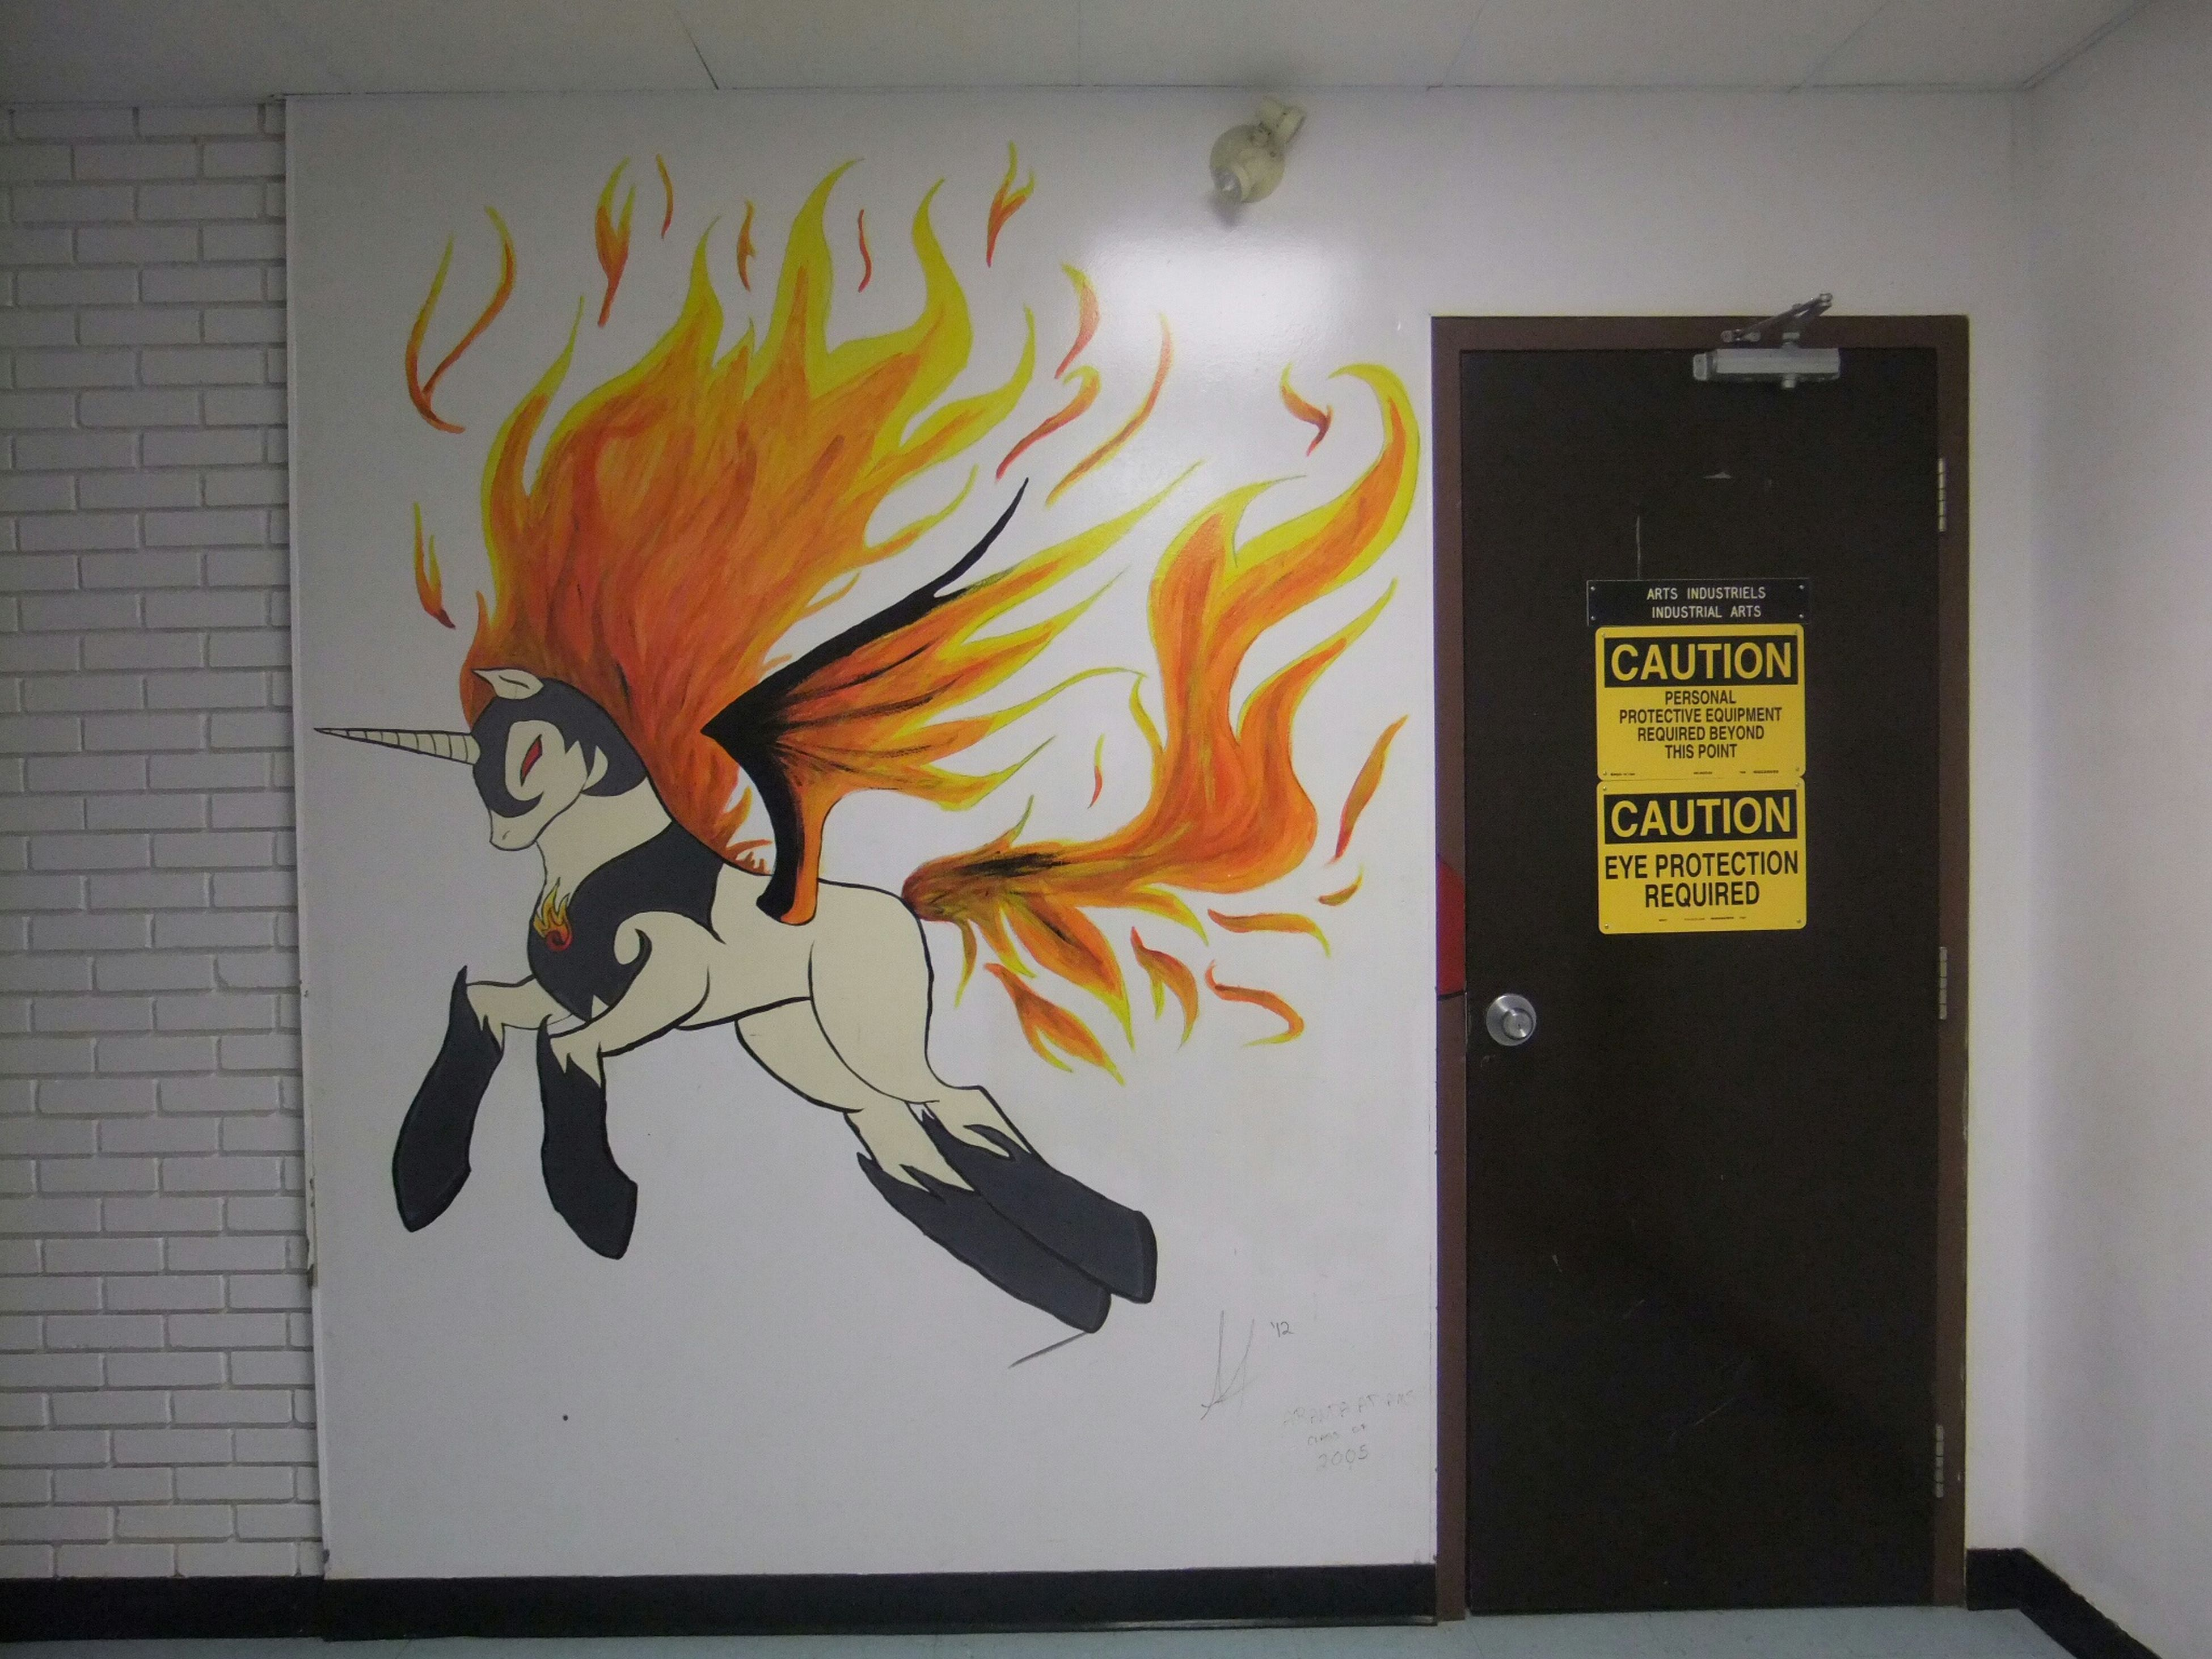 Signs Signage ArtWork Danger Orange Door Do Not Enter Art, Drawing, Creativity Industrial Arts Complex Getting Inspired